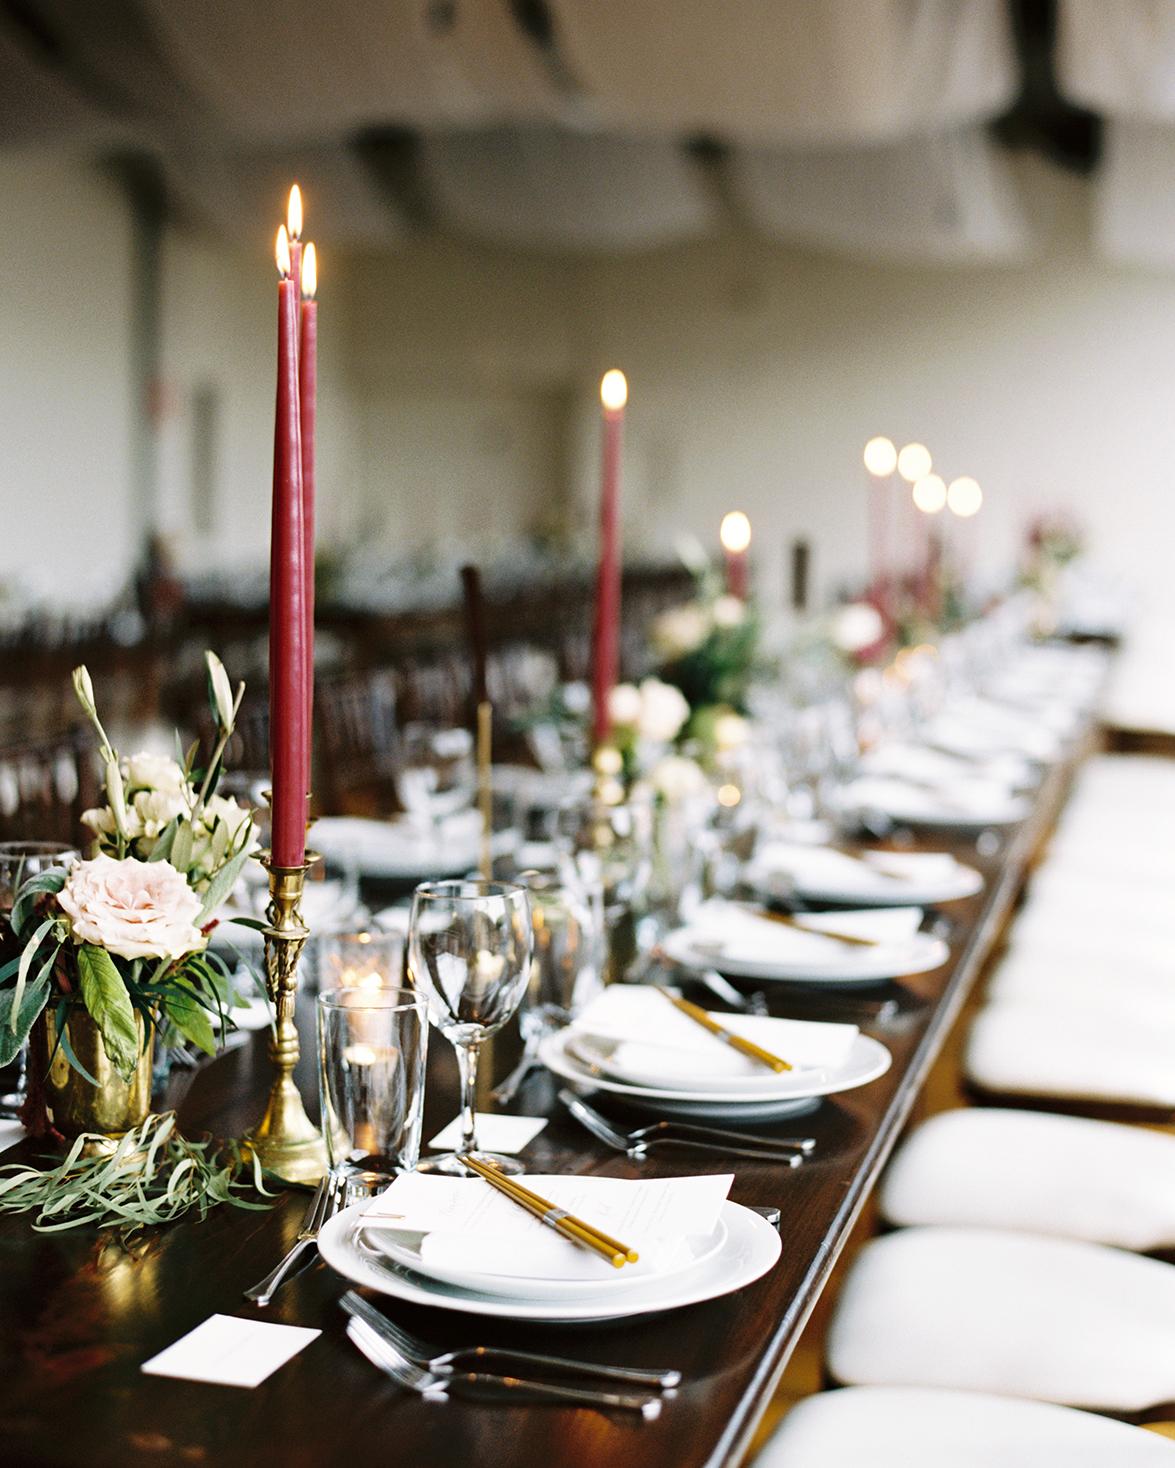 joanna jay wedding reception banquet table